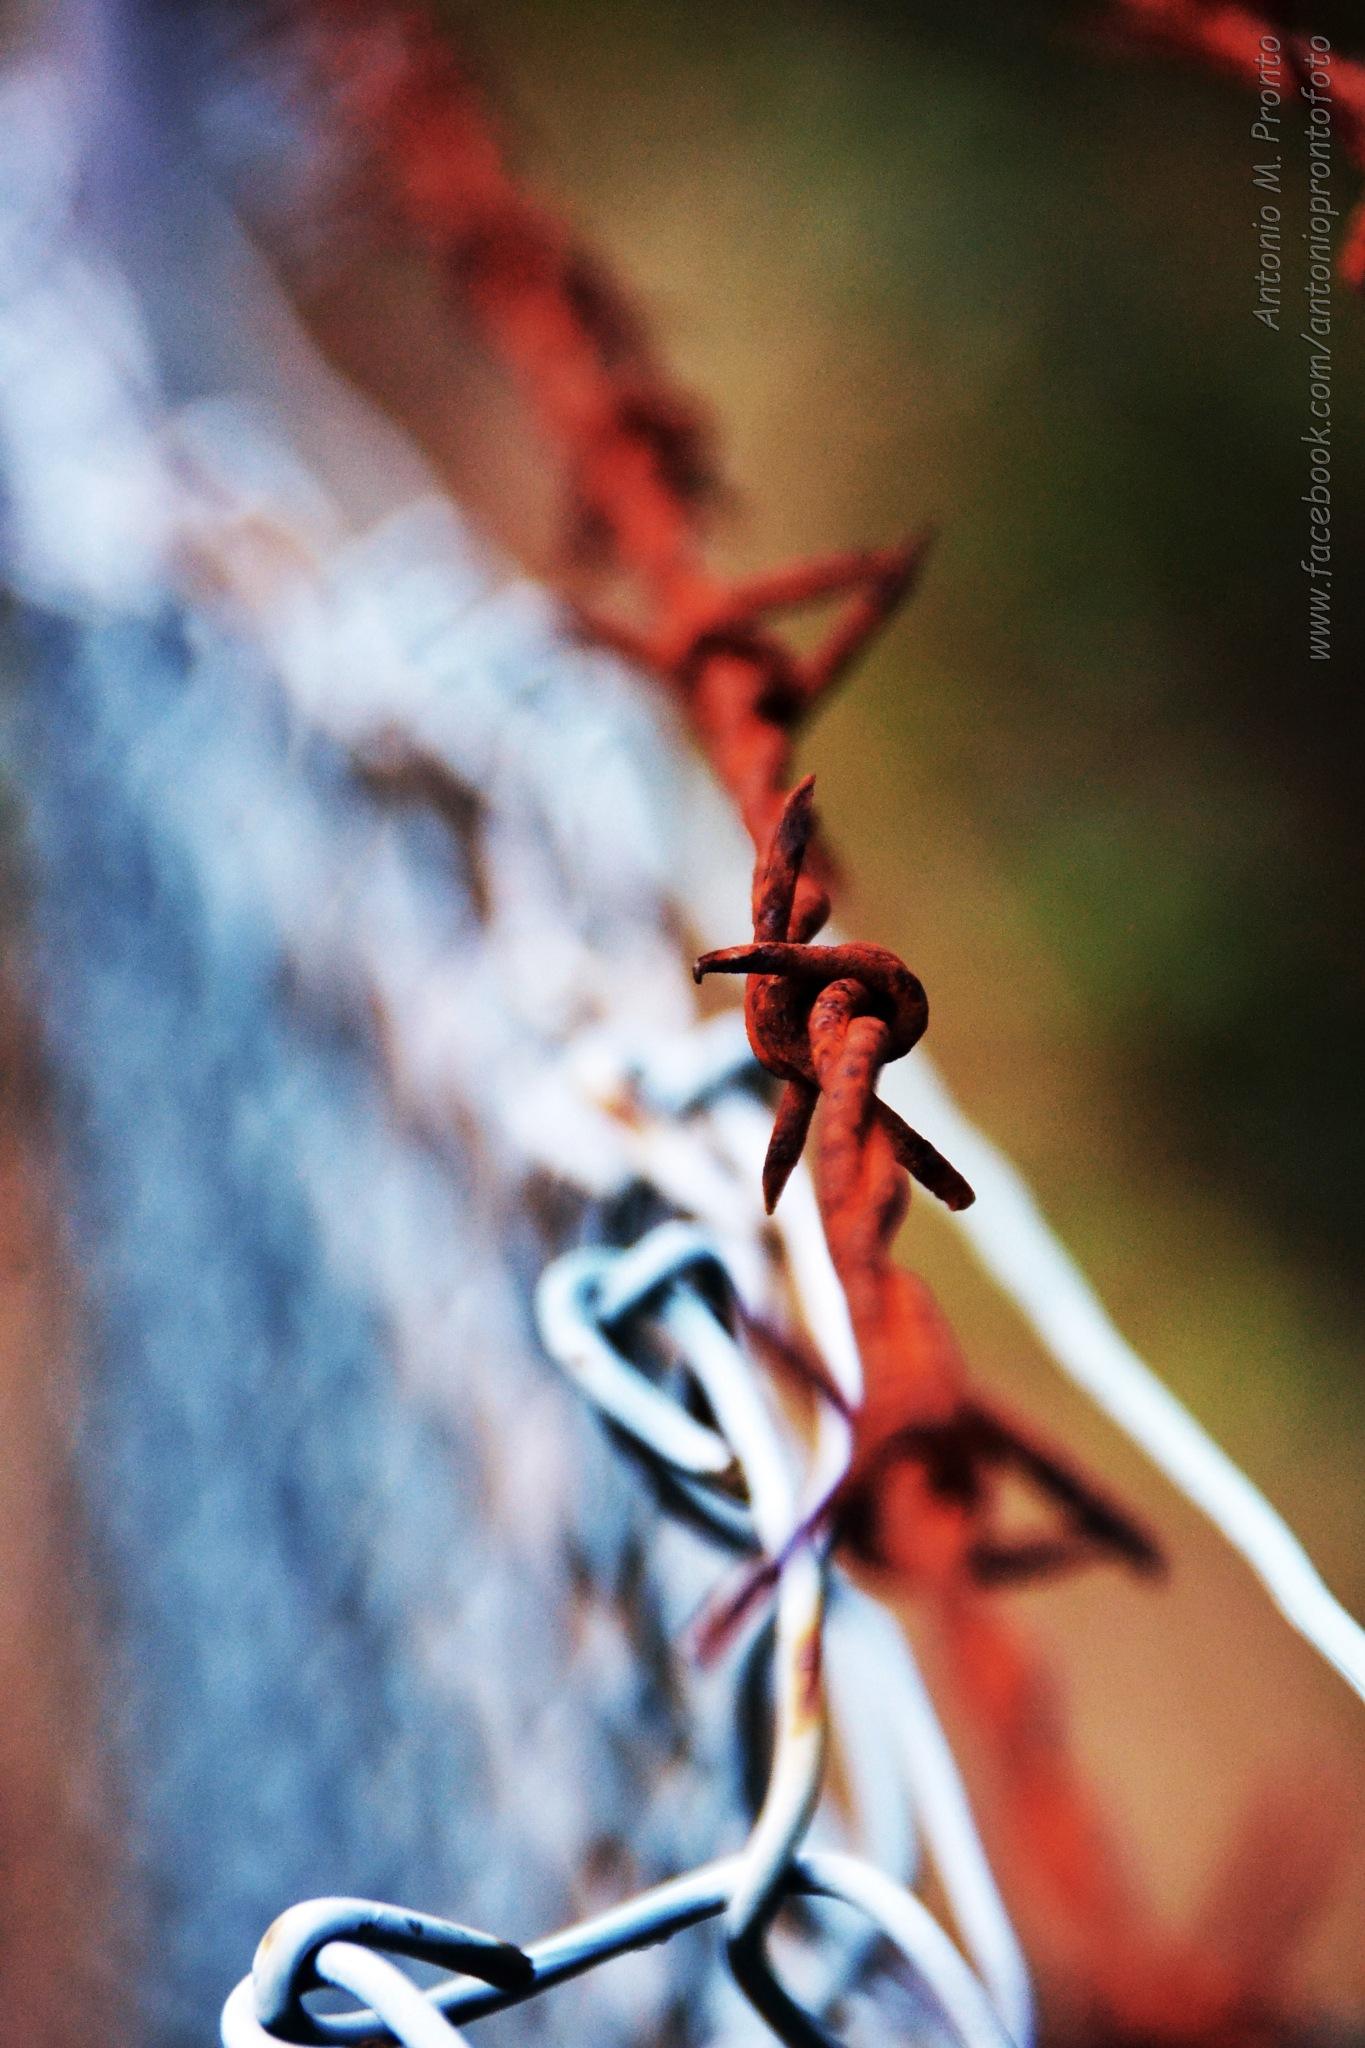 what separates us by Antonio Pronto